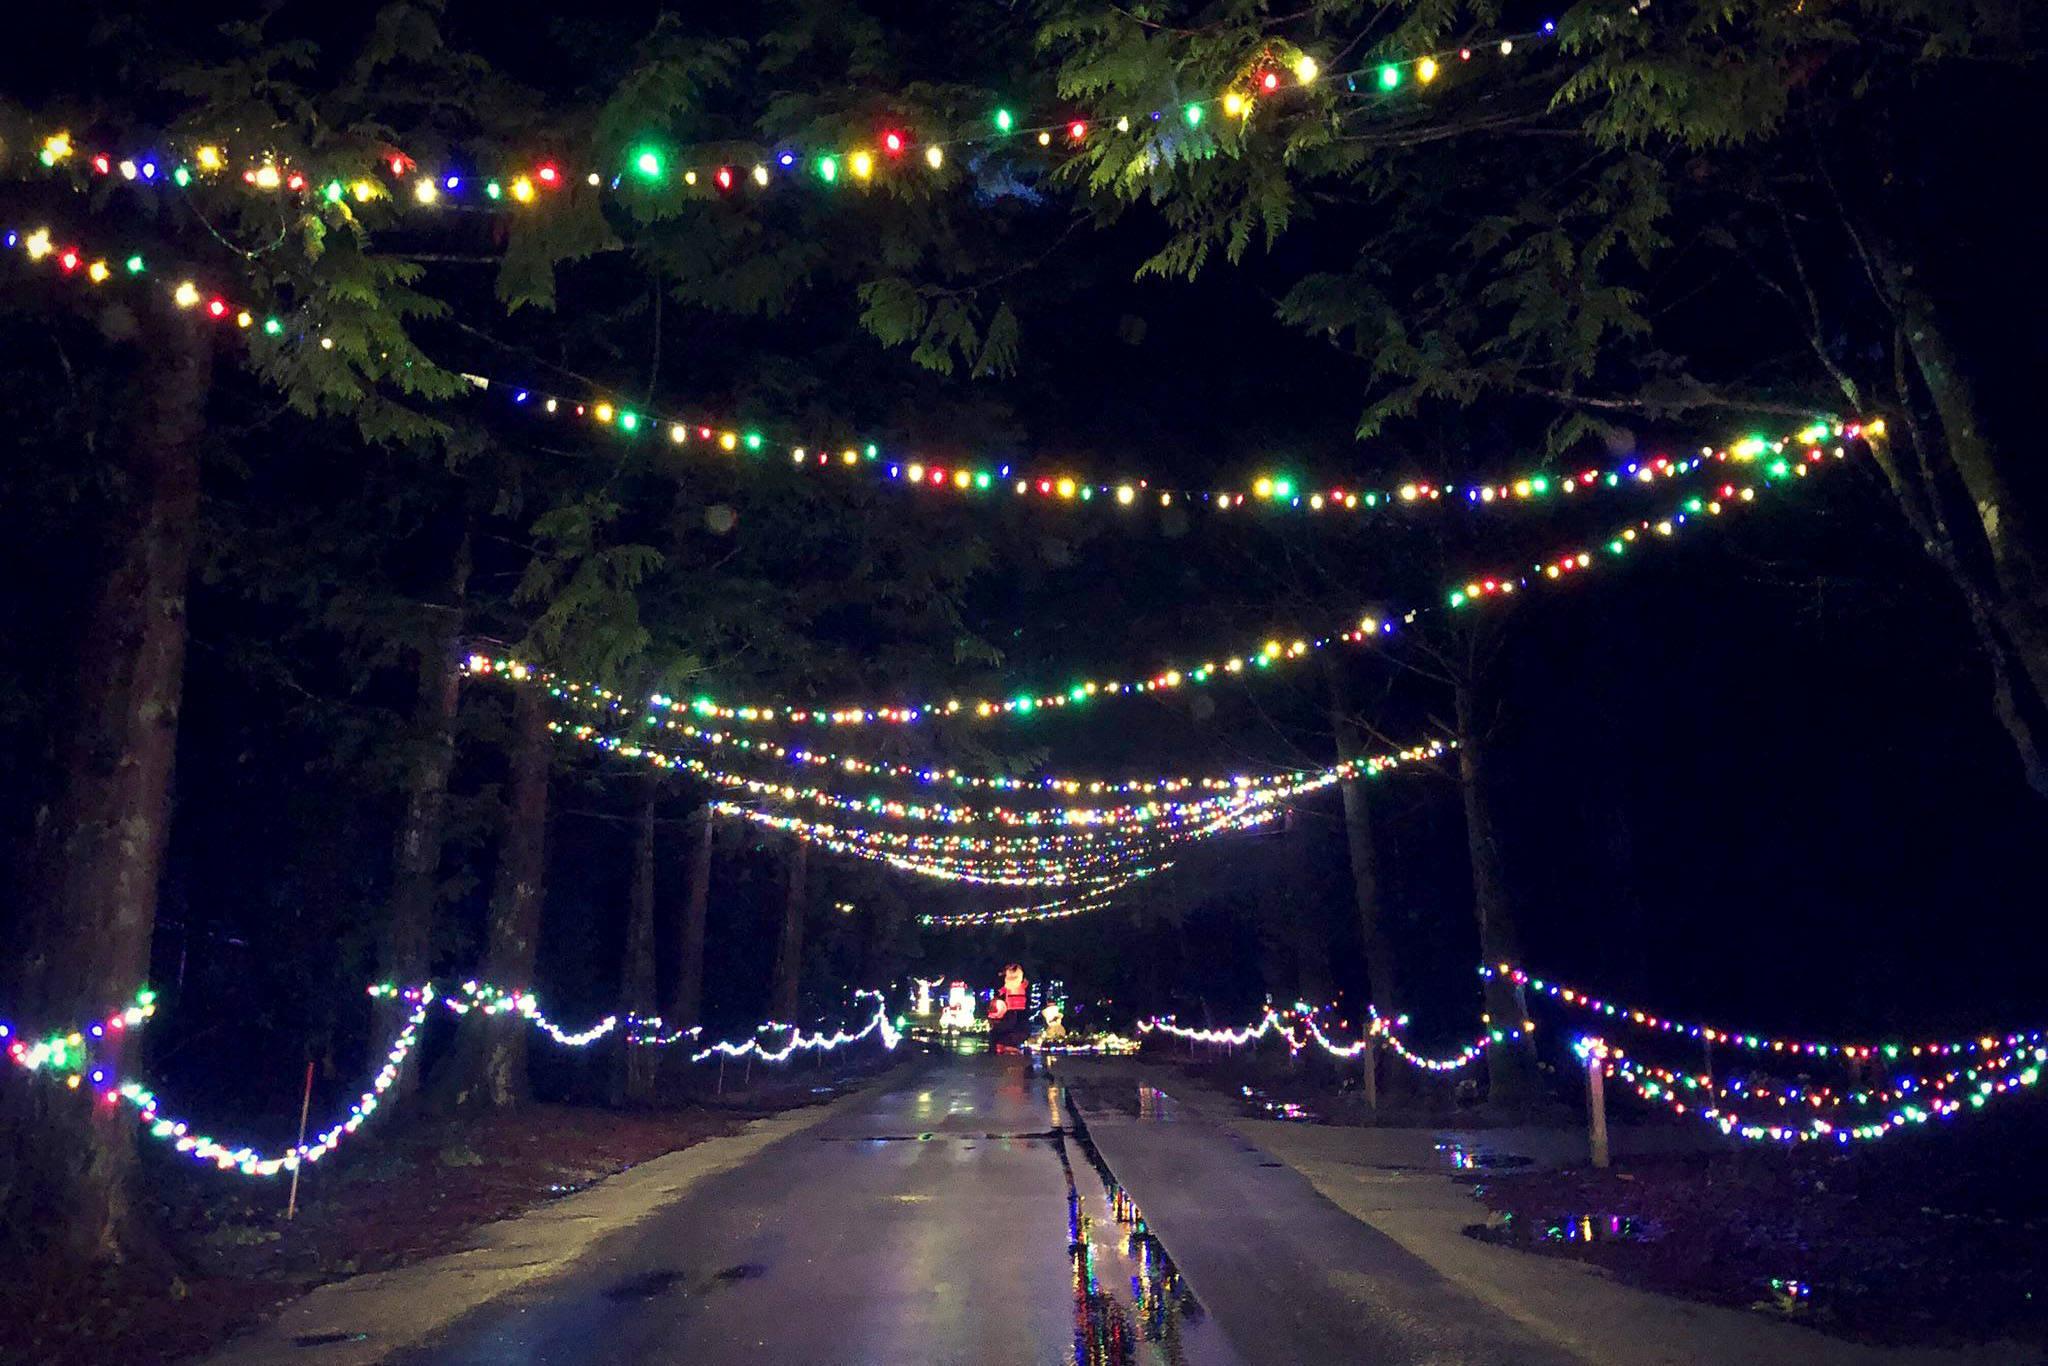 Williams Park Christmas Lights